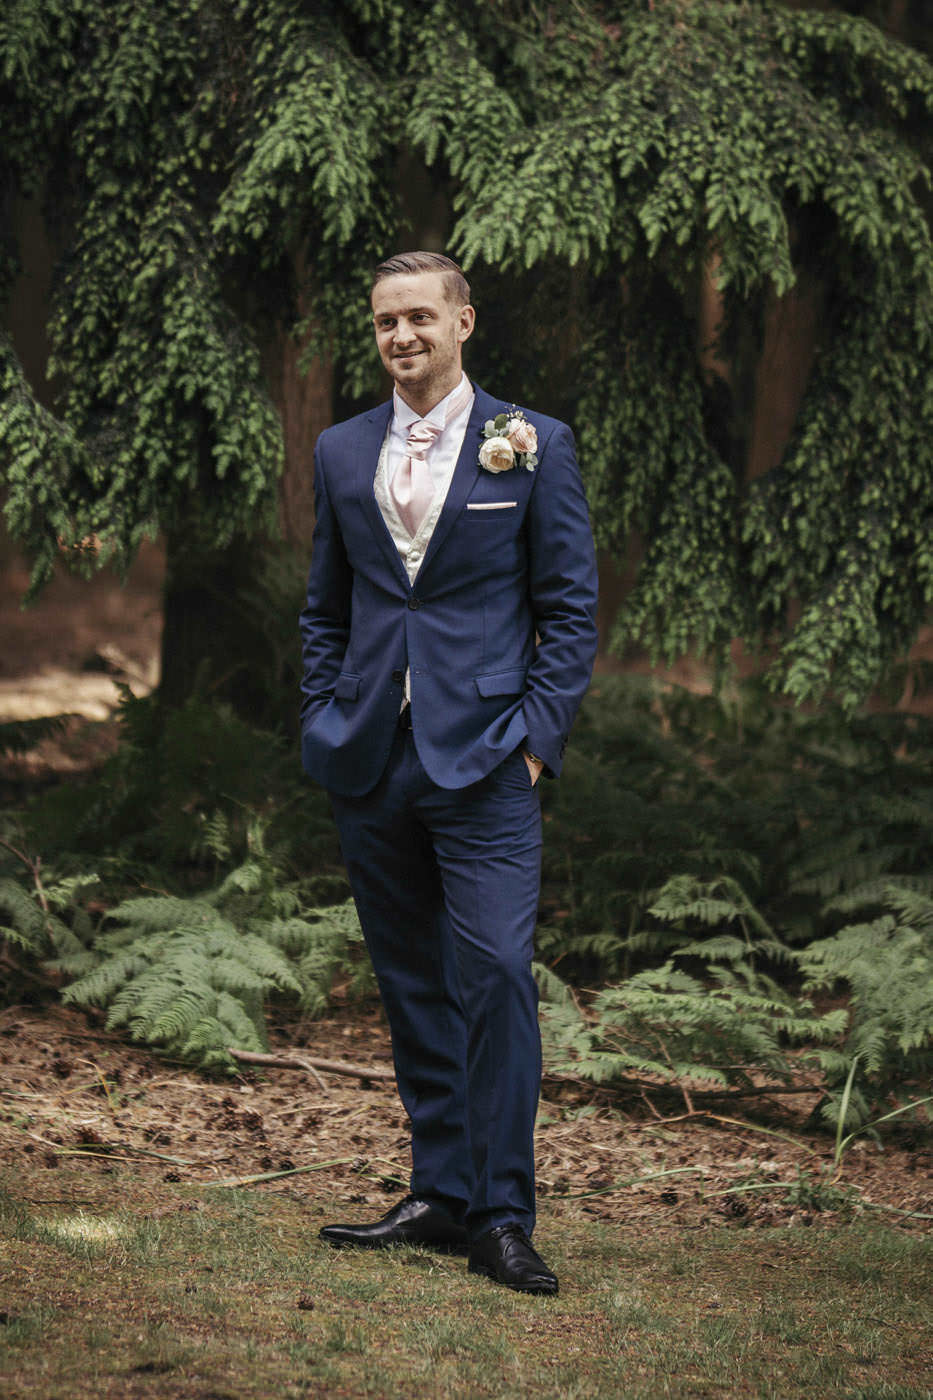 lukeemily foxhills wedding photographer 0076